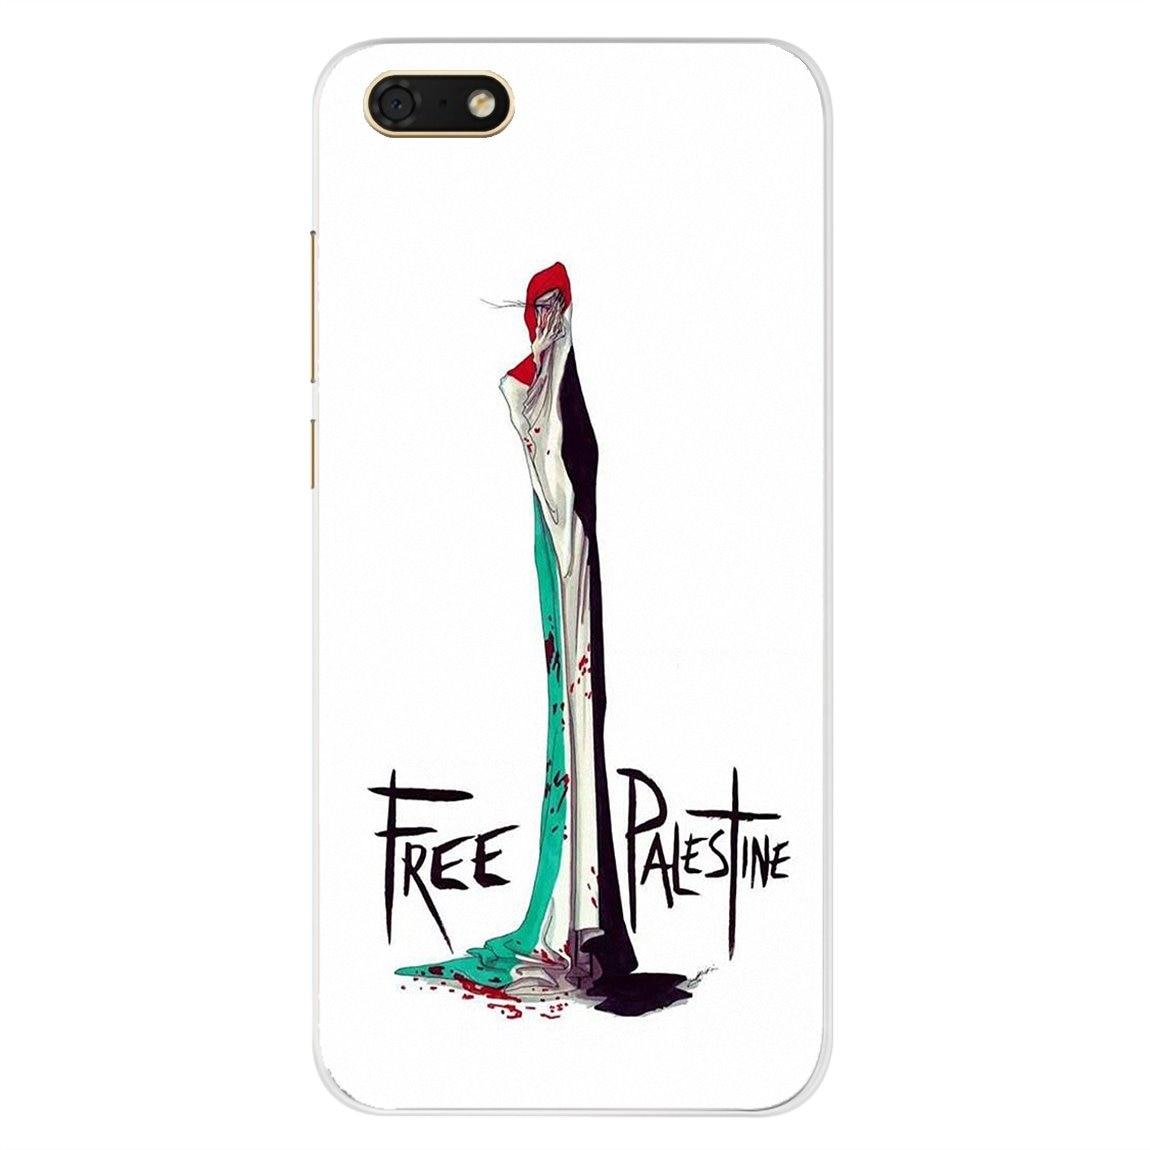 Para o iphone 11 pro 4 4S 5 5S se 5c 6 s 7 8 x xr xs plus max para ipod touch livre palestina arte parar guerras silicone telefone capa saco